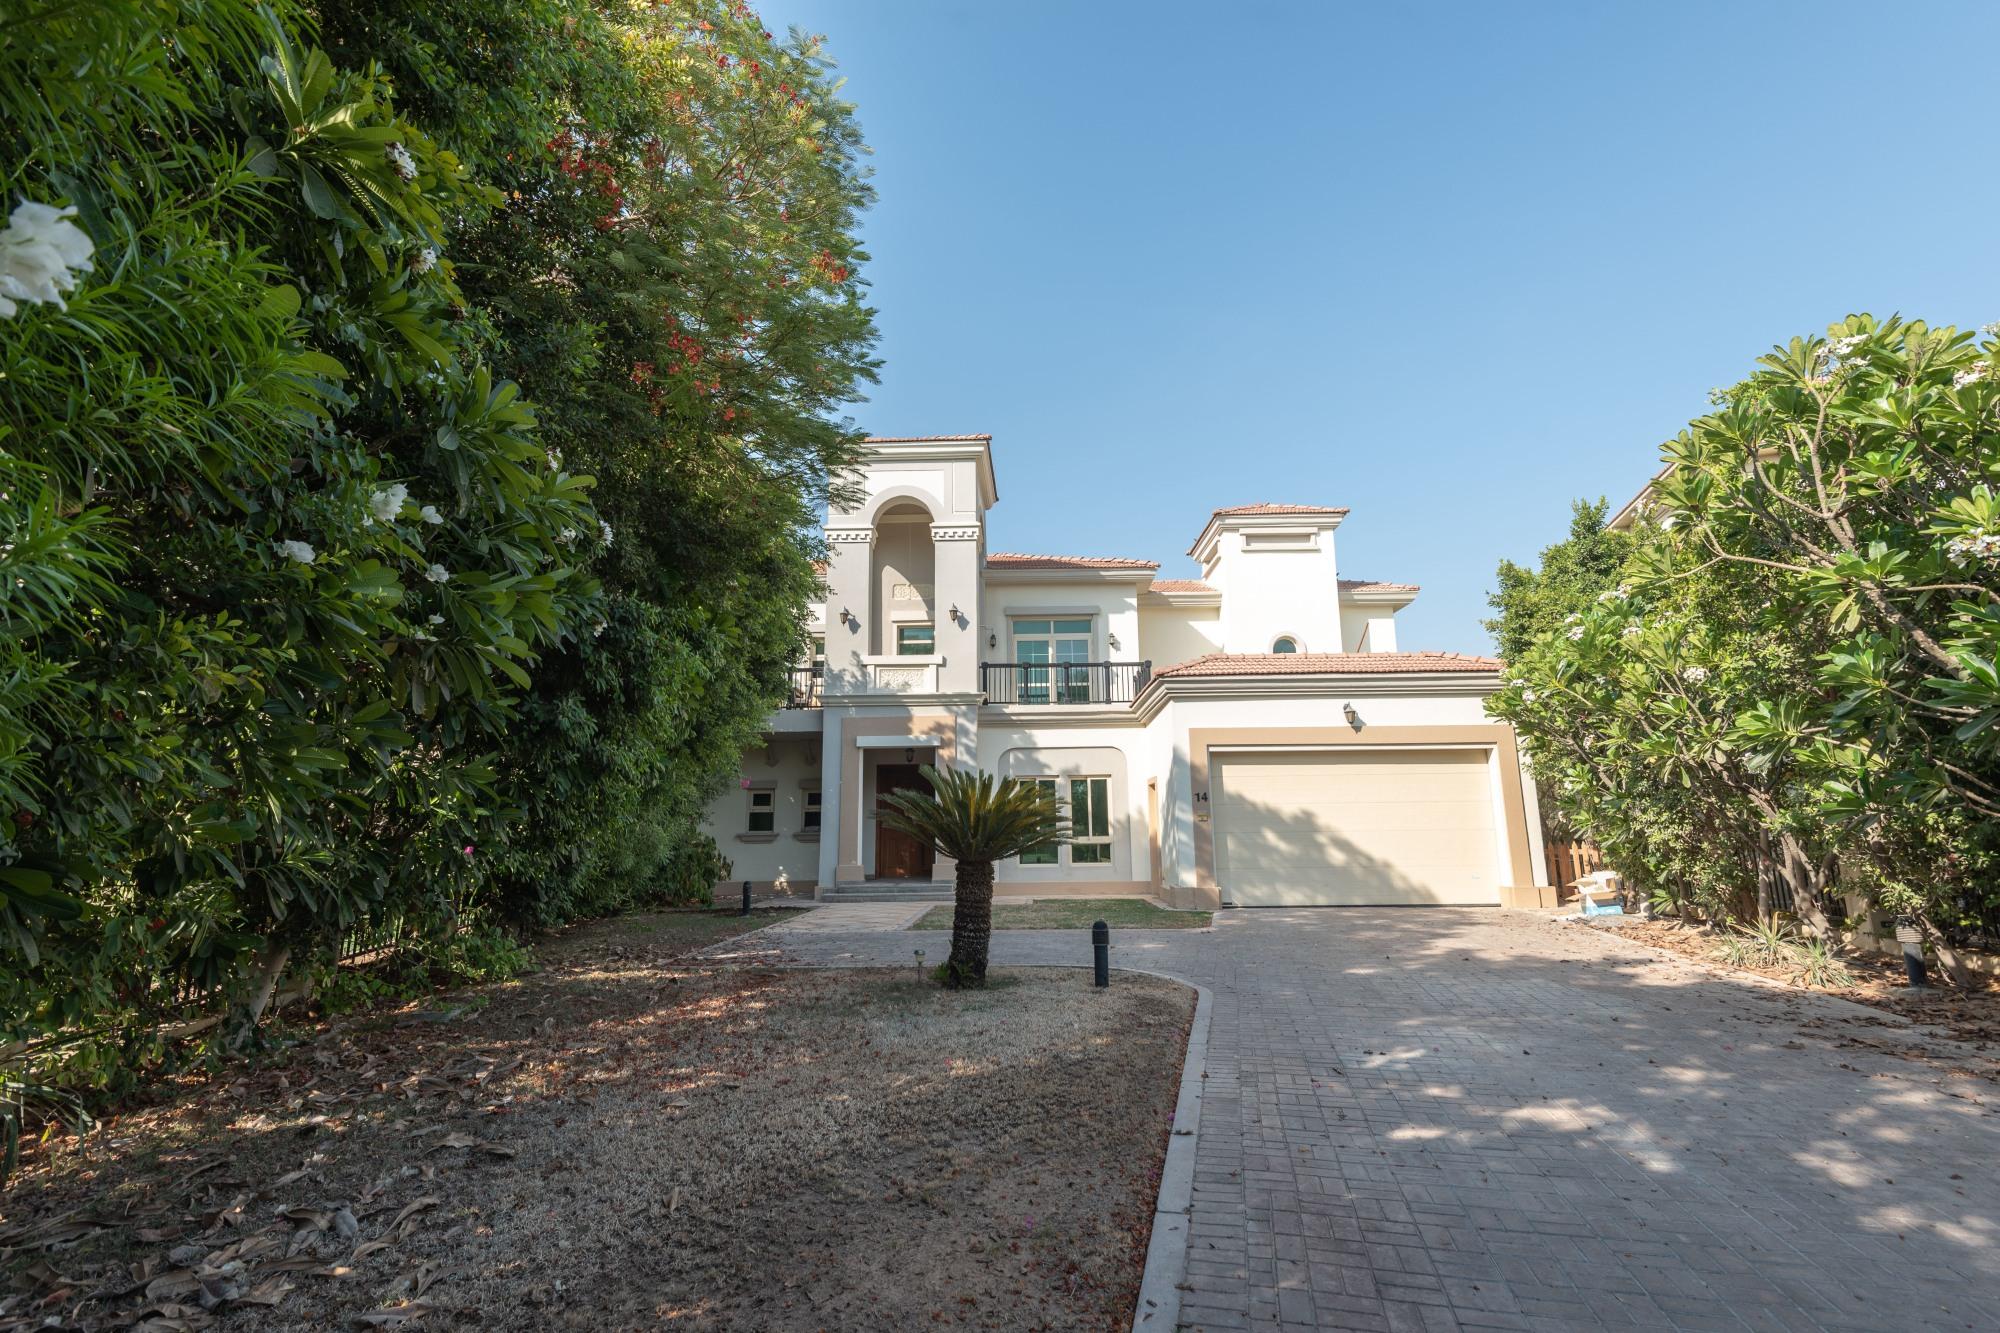 Luxurious 4 Bedroom Plus Family Style Villa